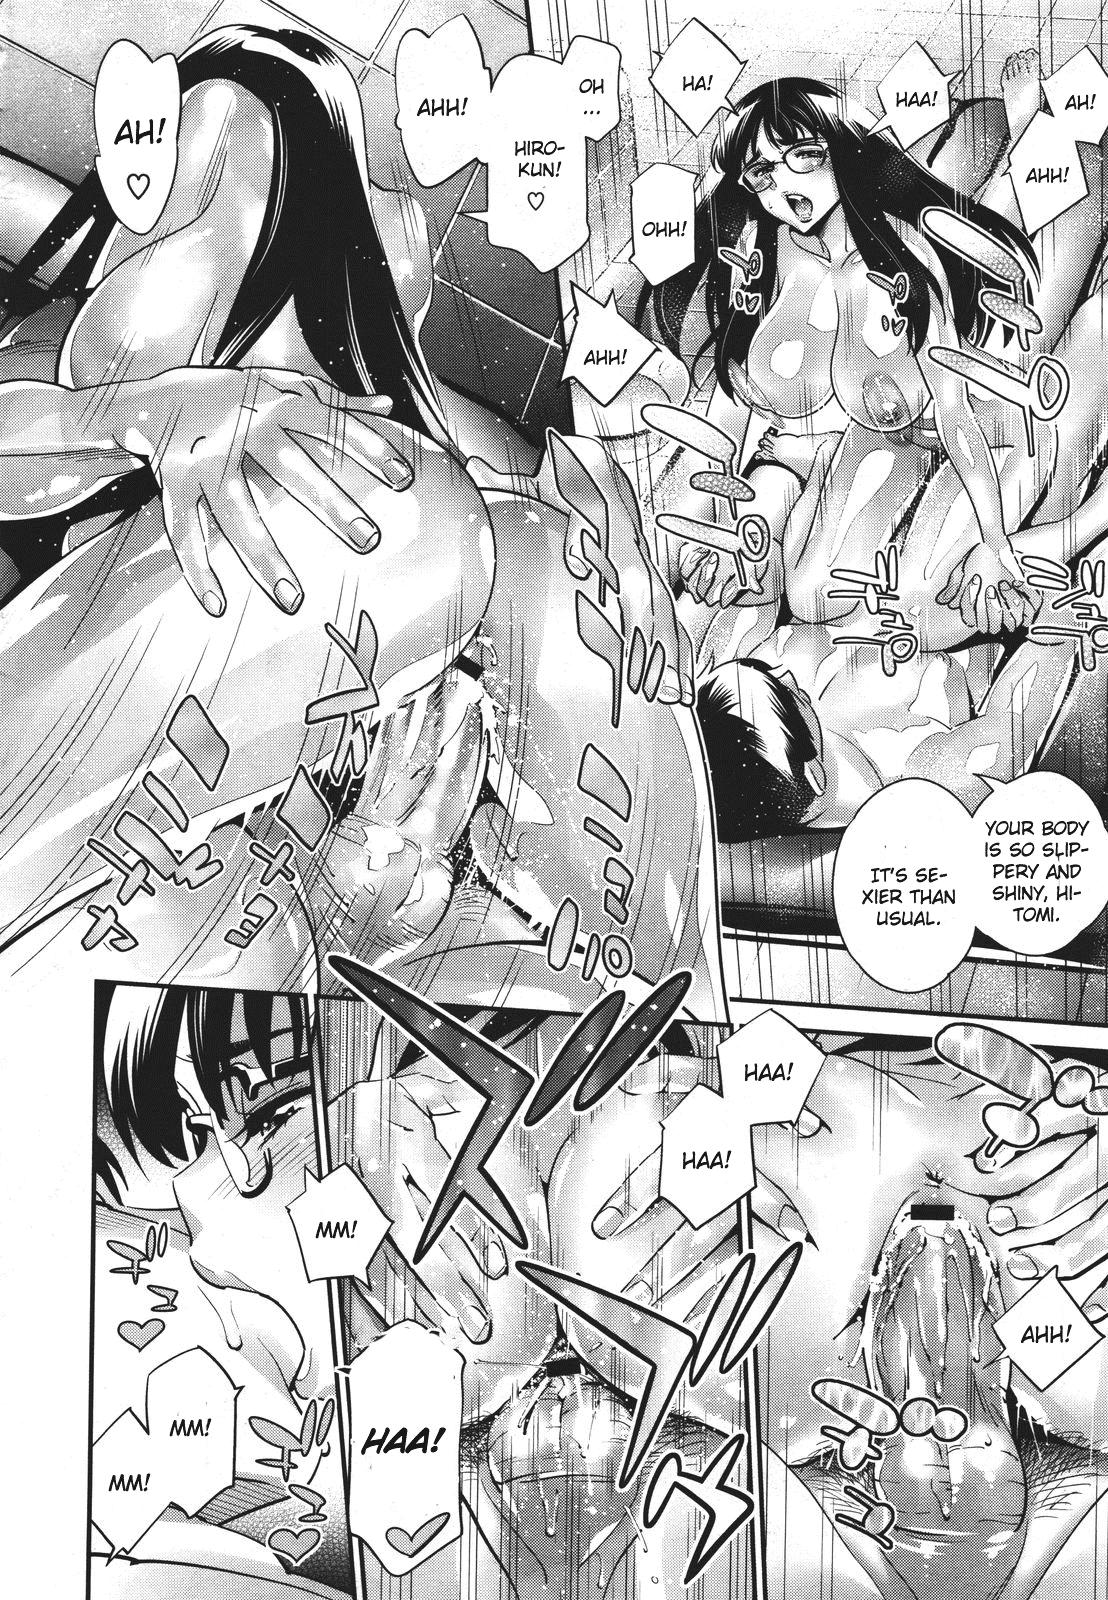 Megane no Megami Chapter 3 23